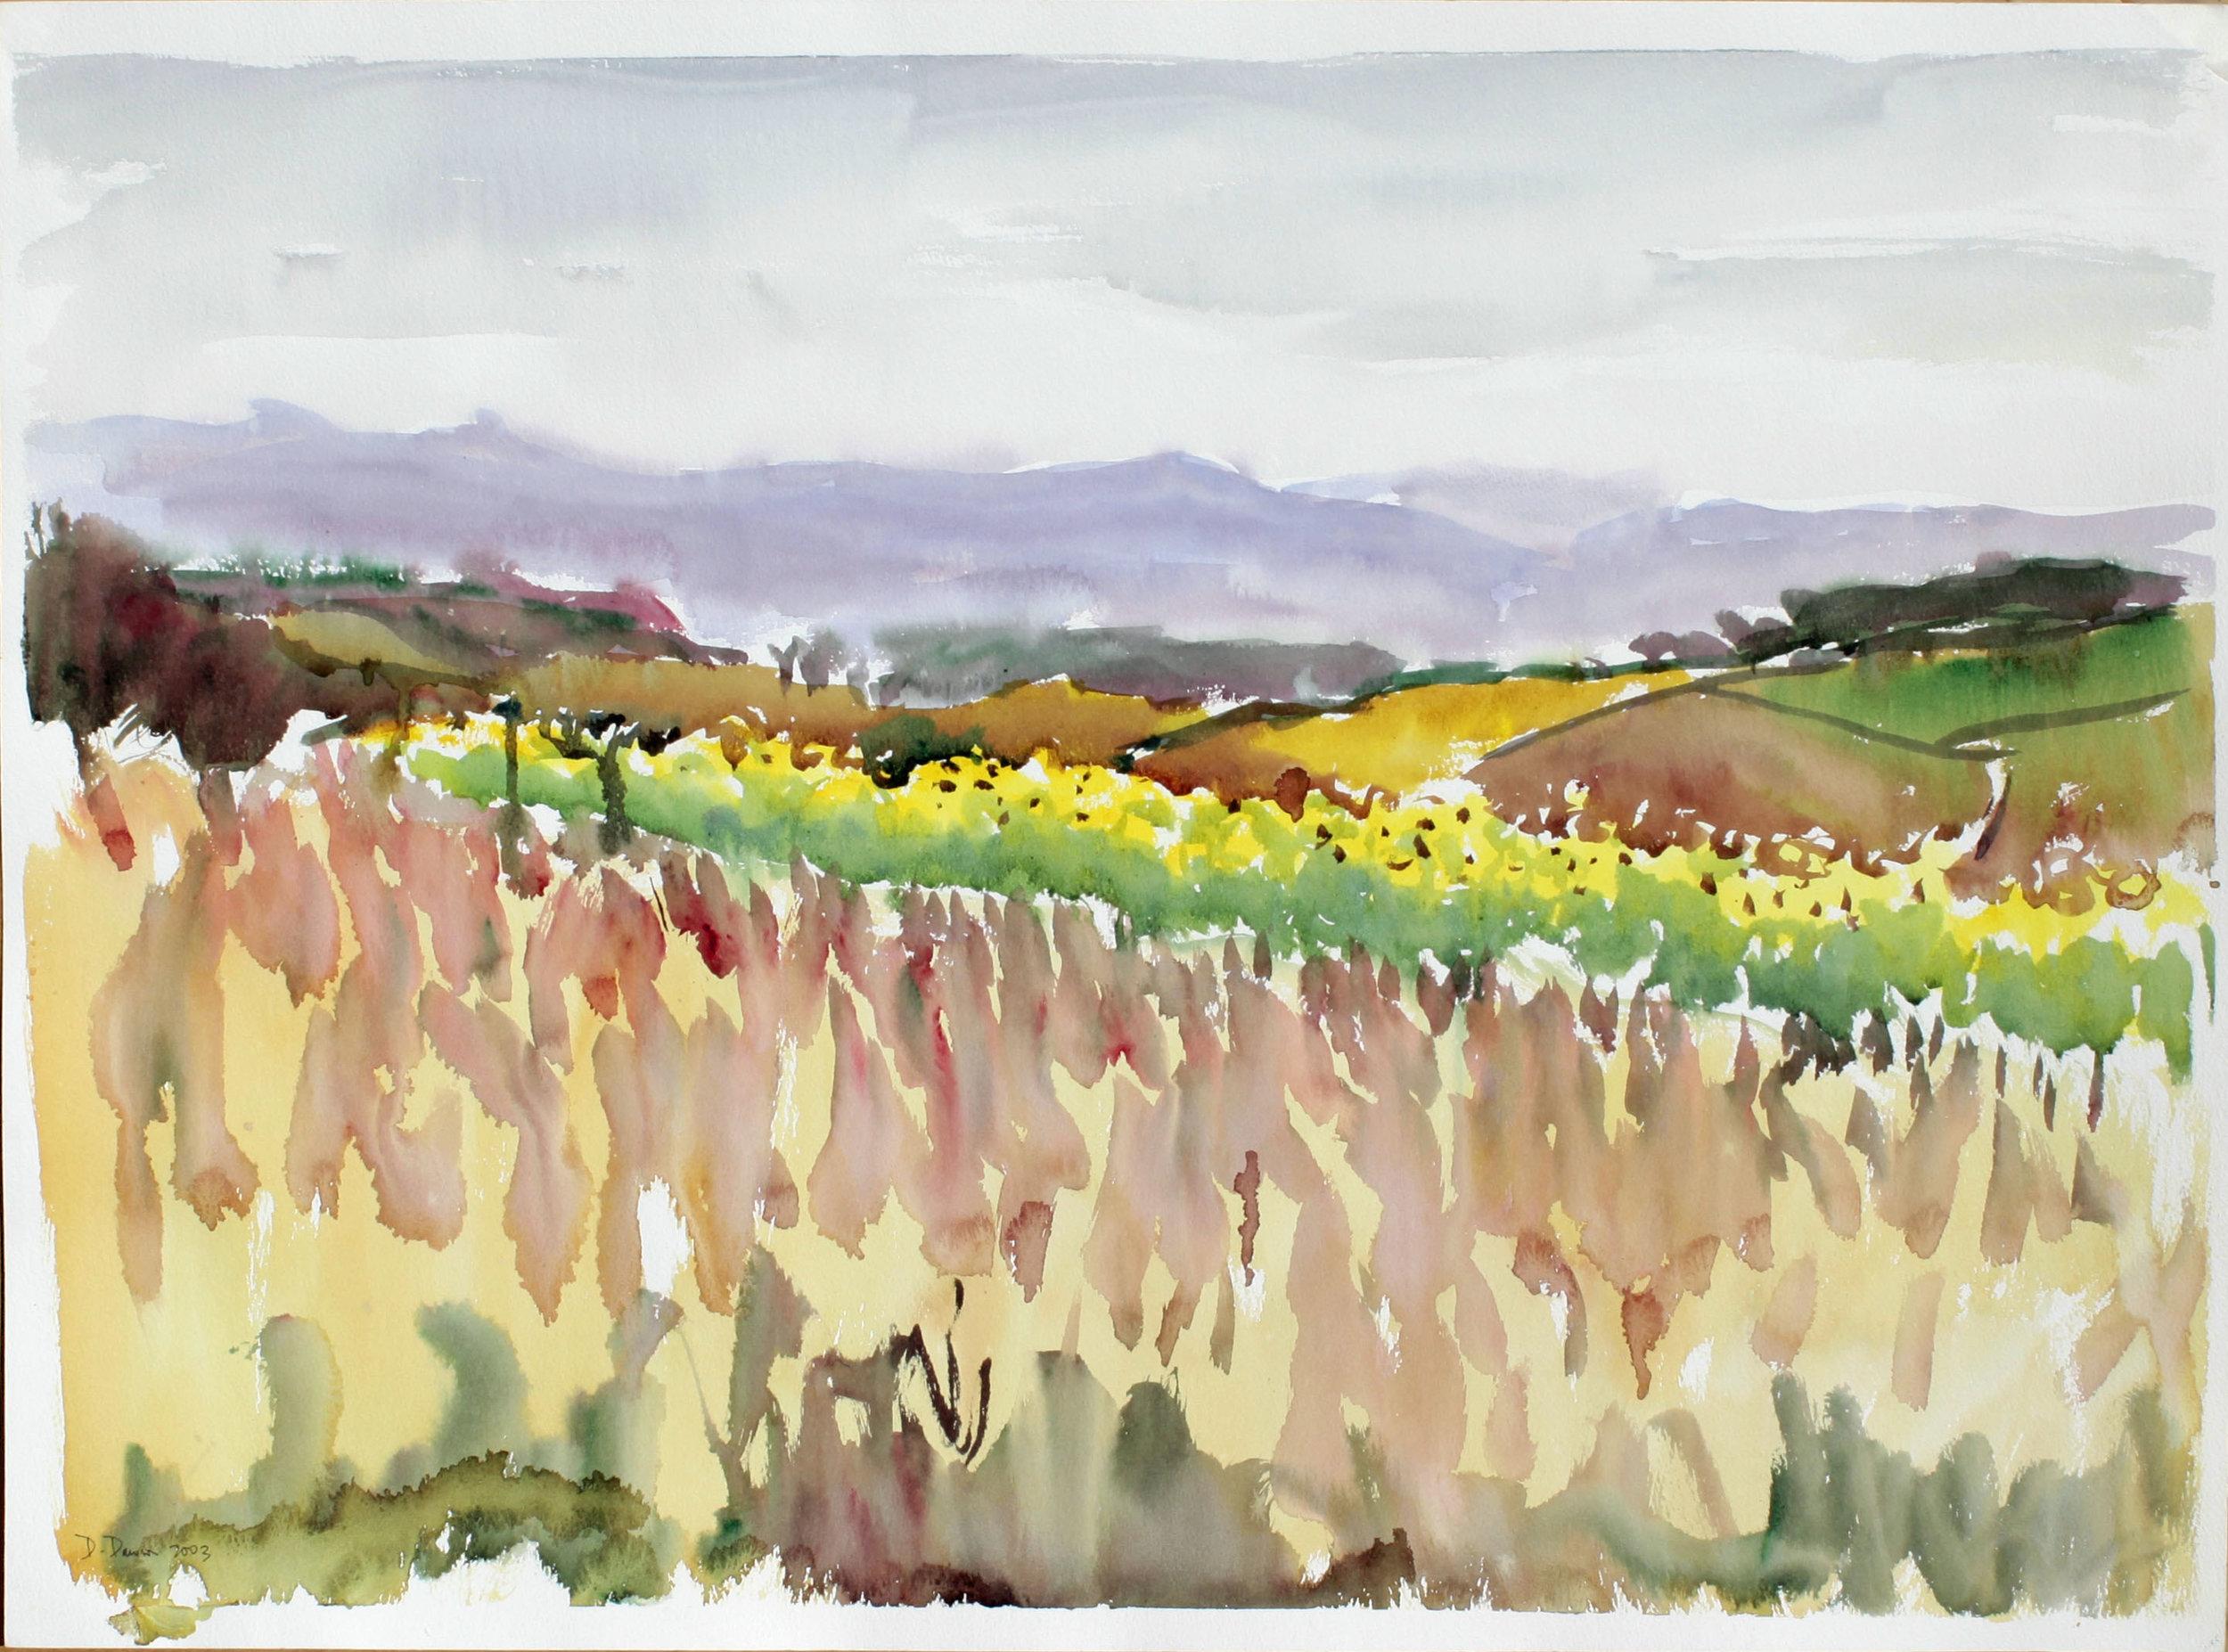 sunflowers_1842.jpg